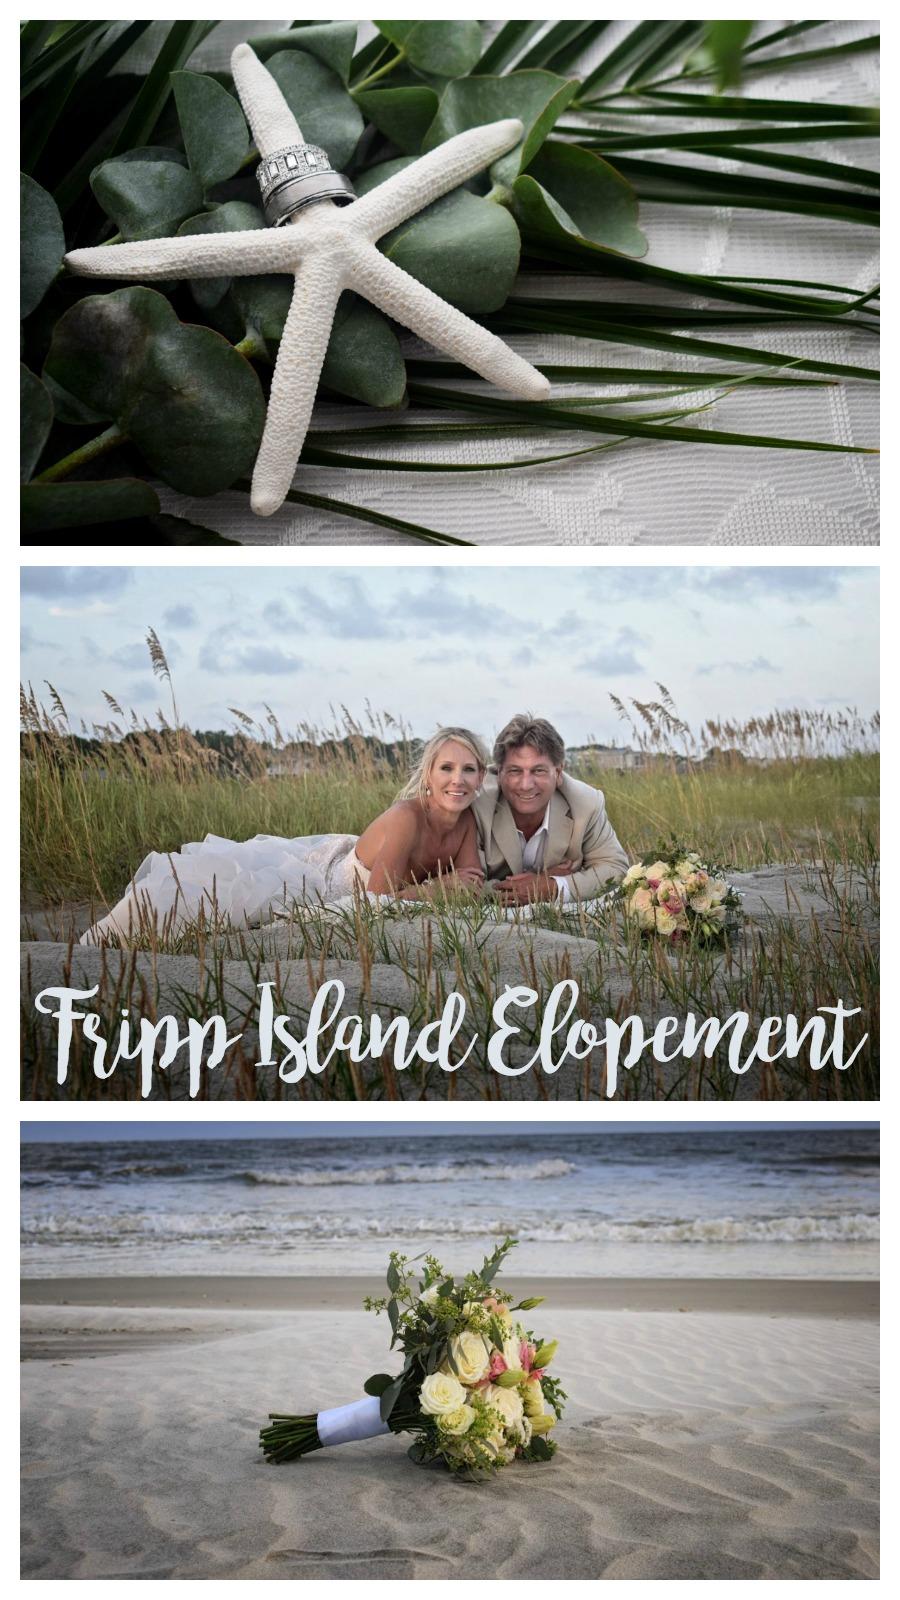 Marian and Jeff: Oceanfront Fripp Island Elopement   Palmetto State Weddings   Dandelion Weddings Photography   South Carolina beach wedding   casual beach wedding inspiration